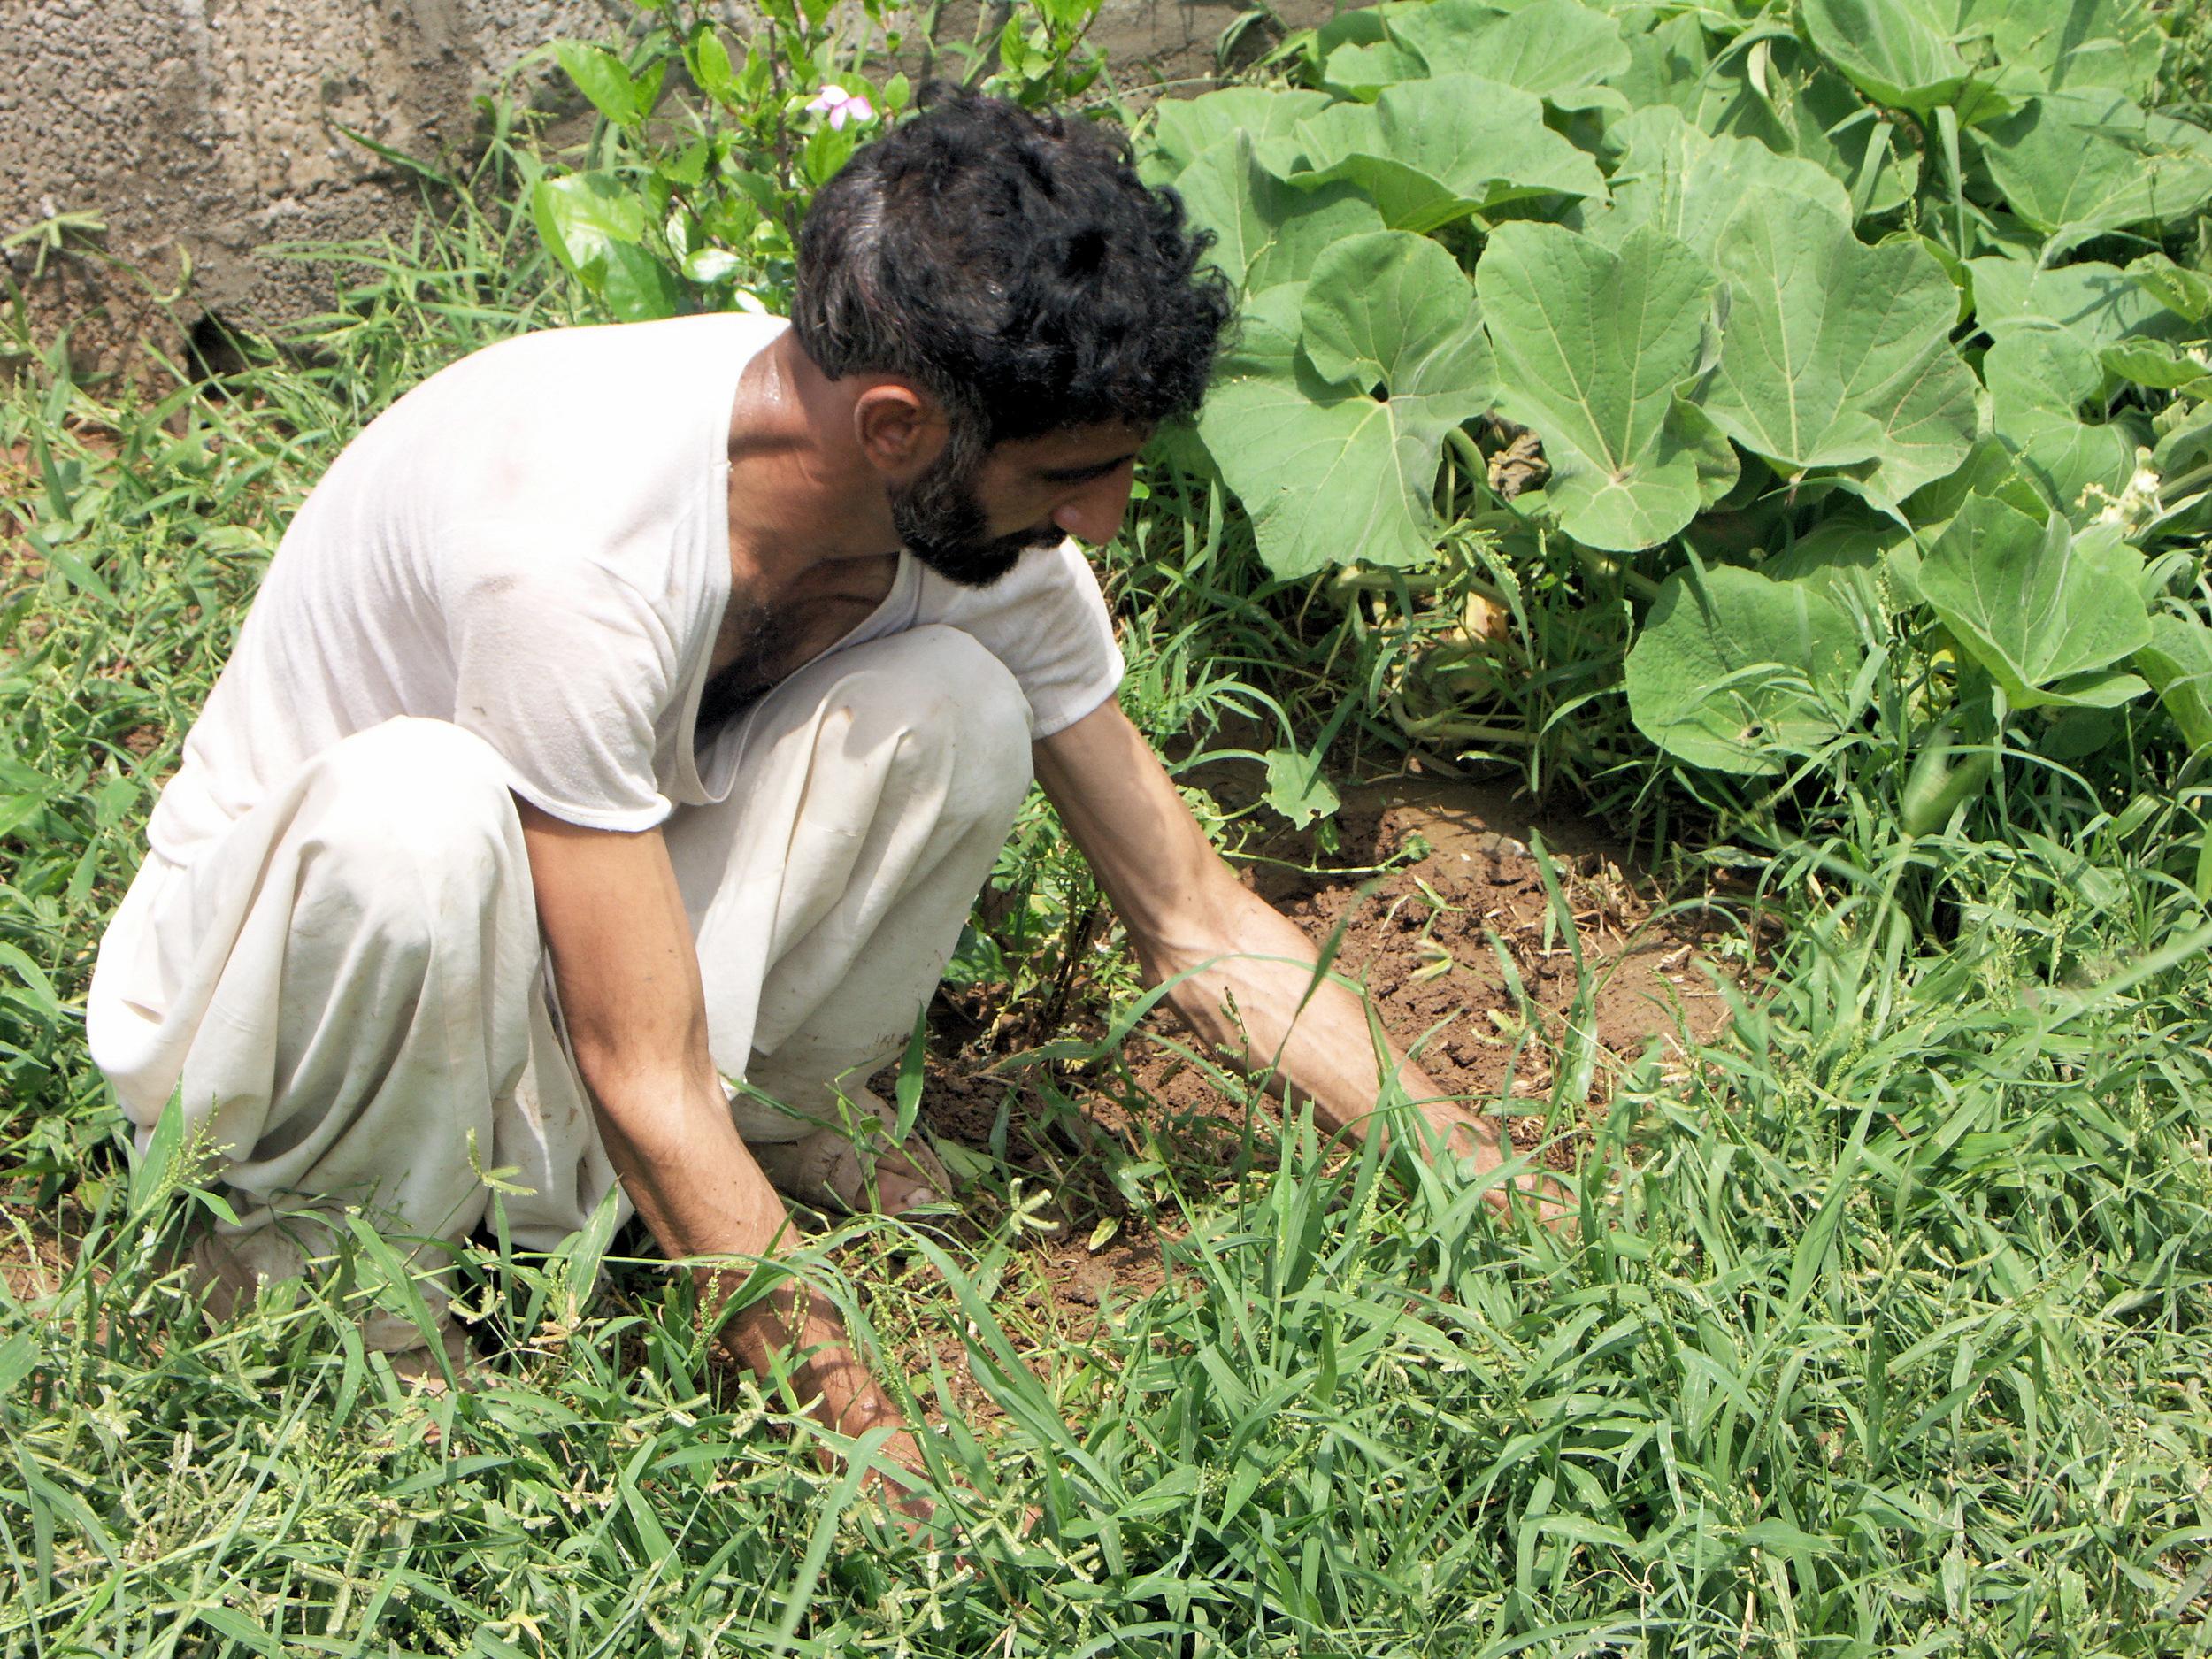 041 PB Gardener.jpg